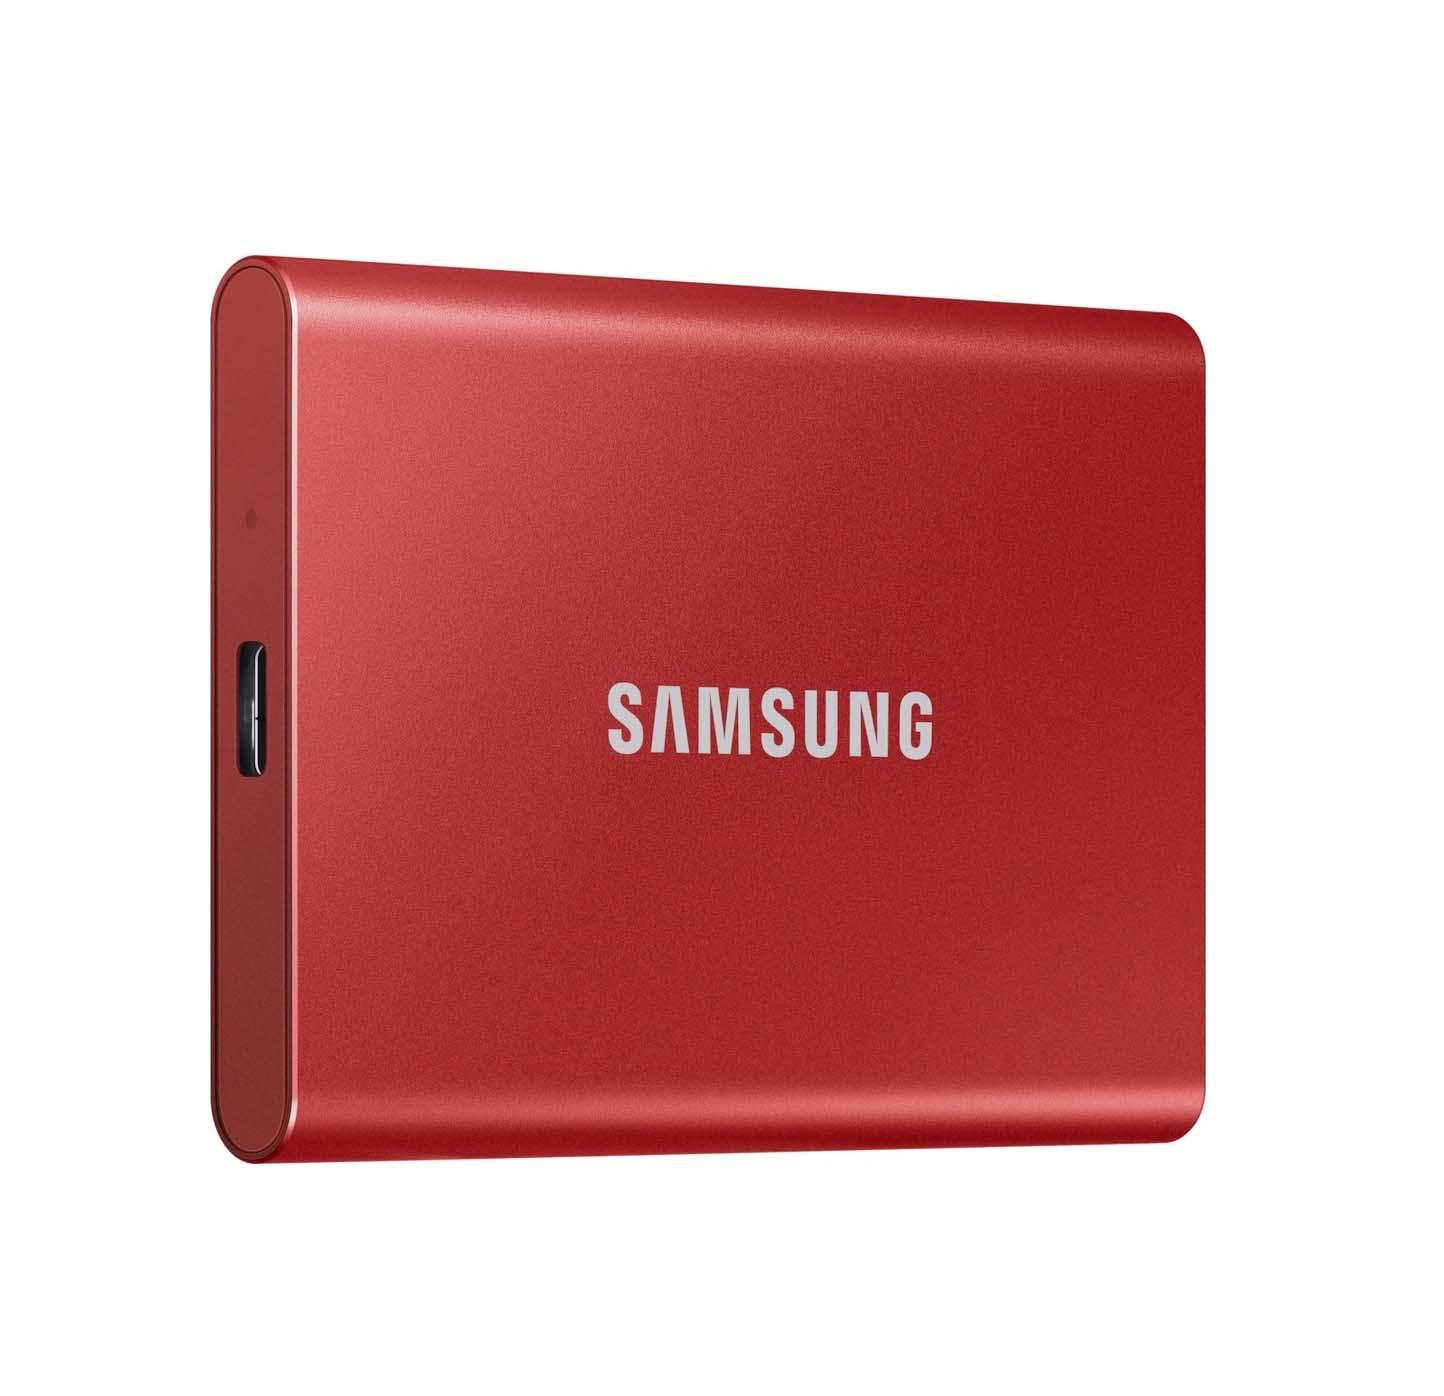 Samsung Portable SSD T7 500GB Εξωτερικός Σκληρός Δίσκος Red  MU-PC500R